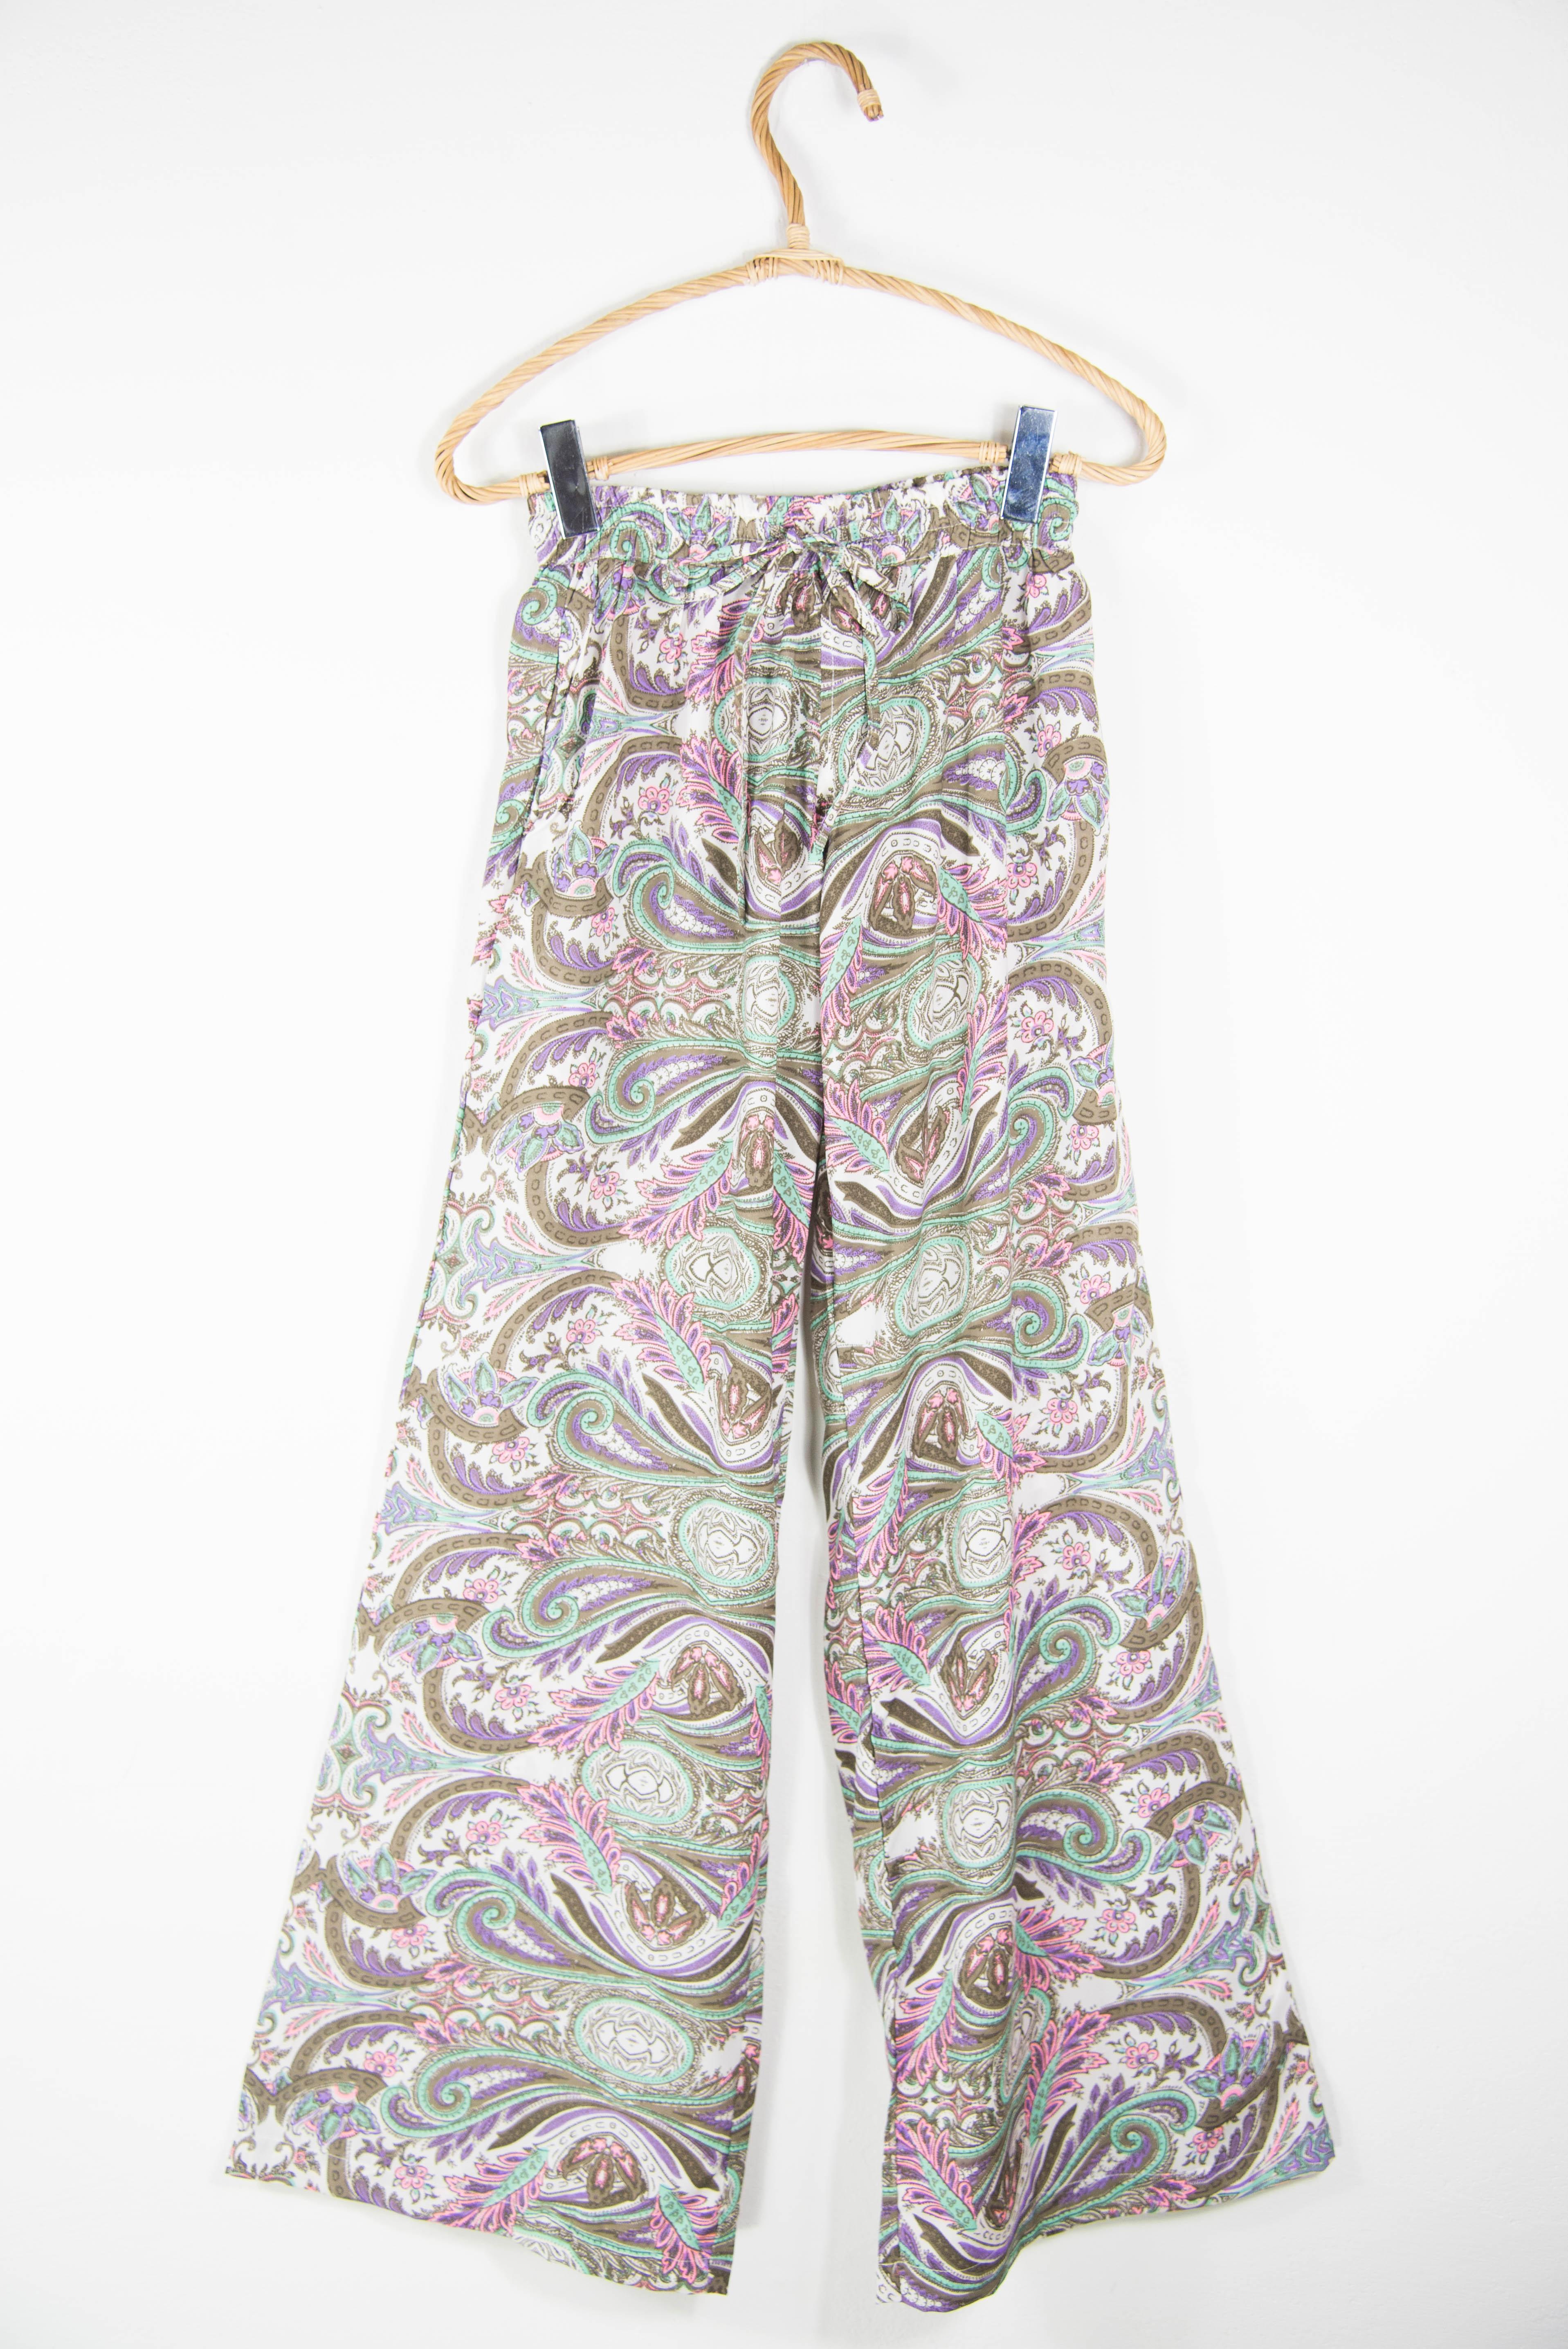 Pantalone estivo lungo. Vendita online pantaloni donna